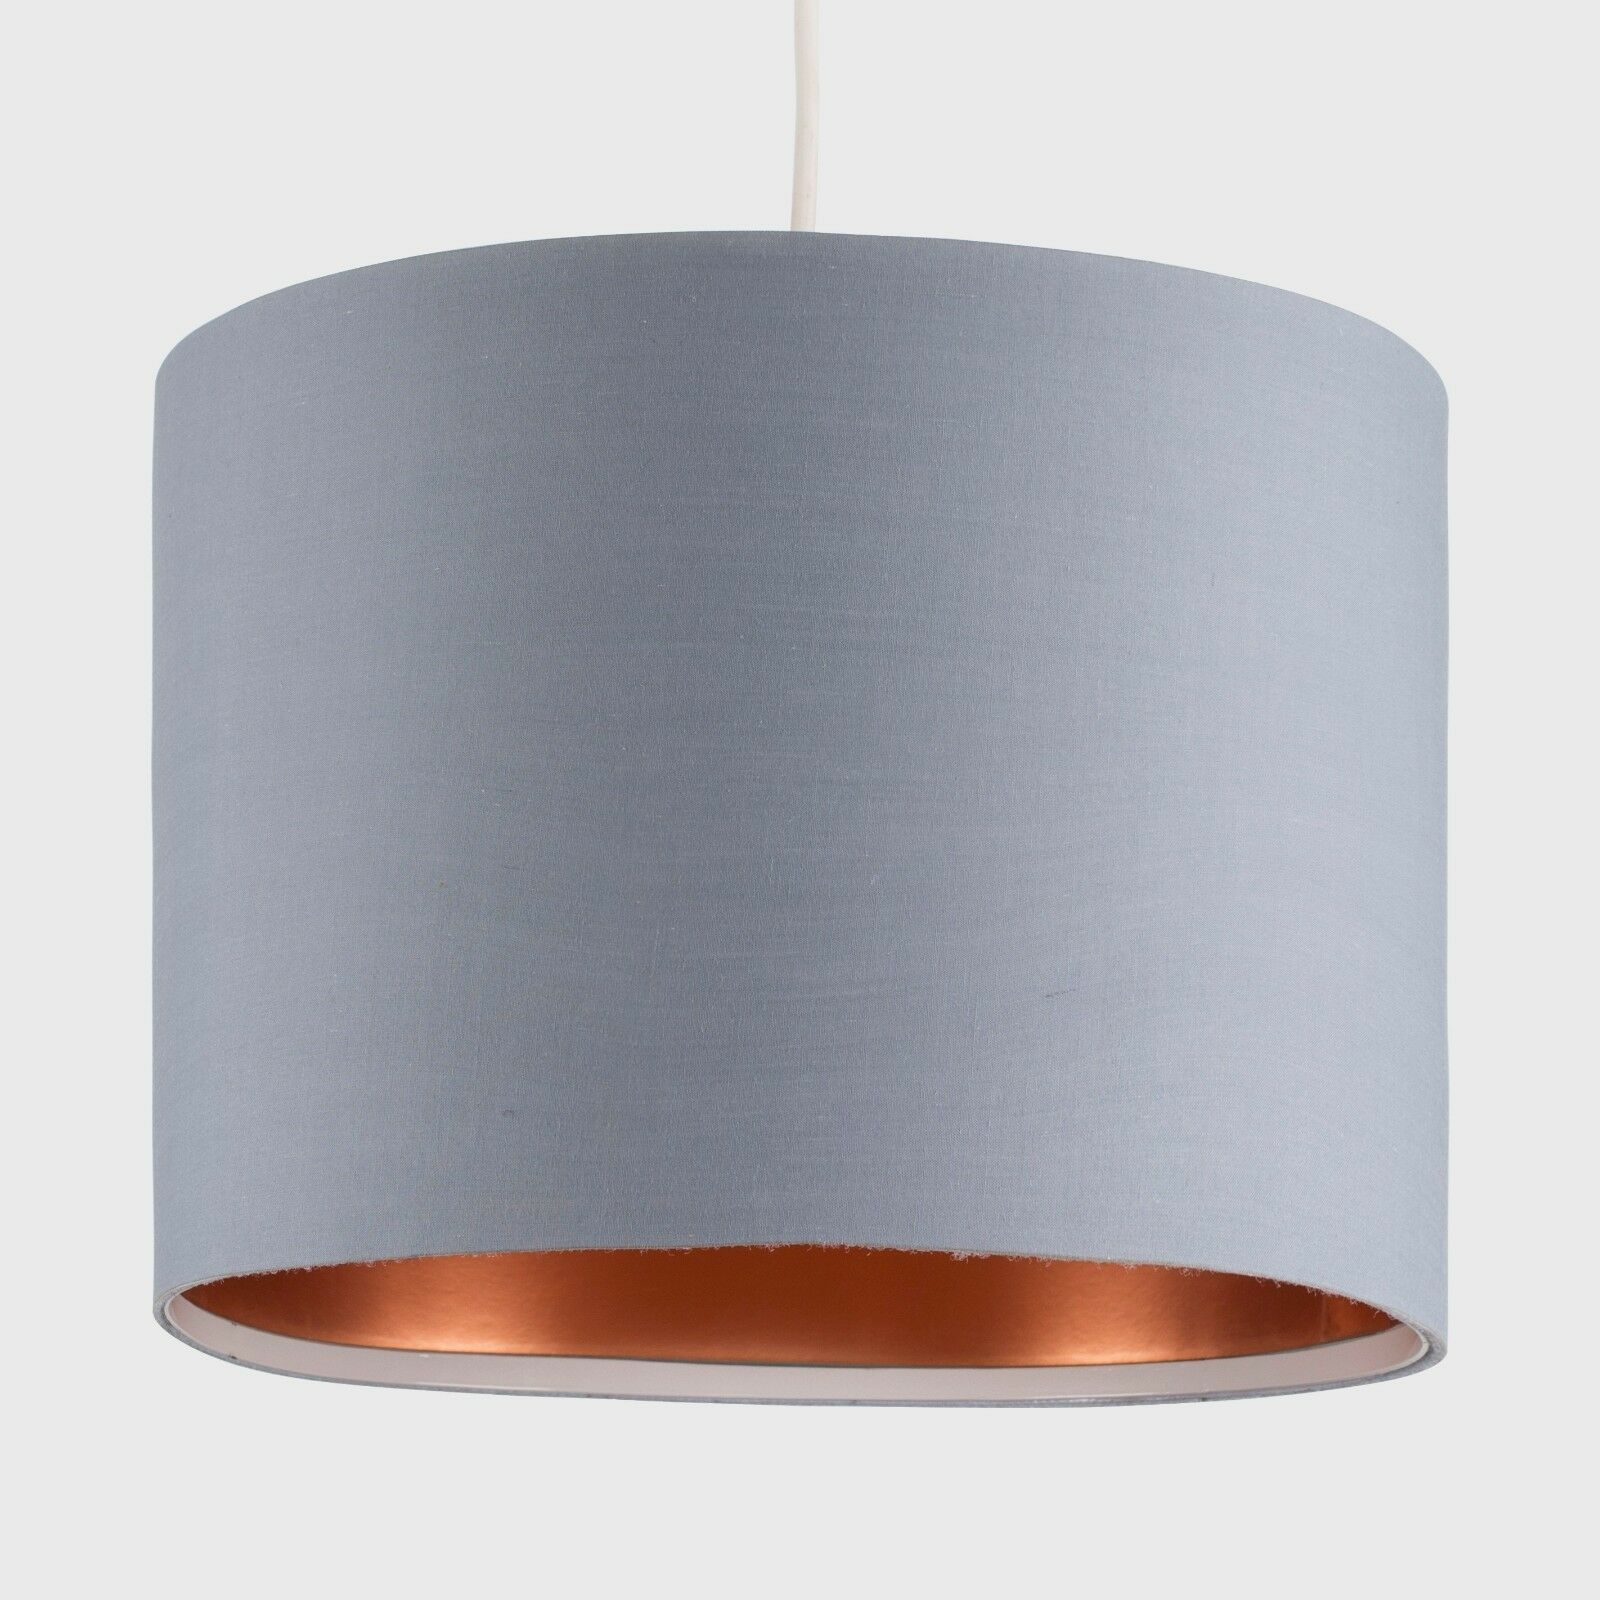 Tela-moderna-algodon-facil-ajuste-Techo-Colgante-Pantalla-De-Mesa-tonos-de-luz-de-tambor miniatura 131